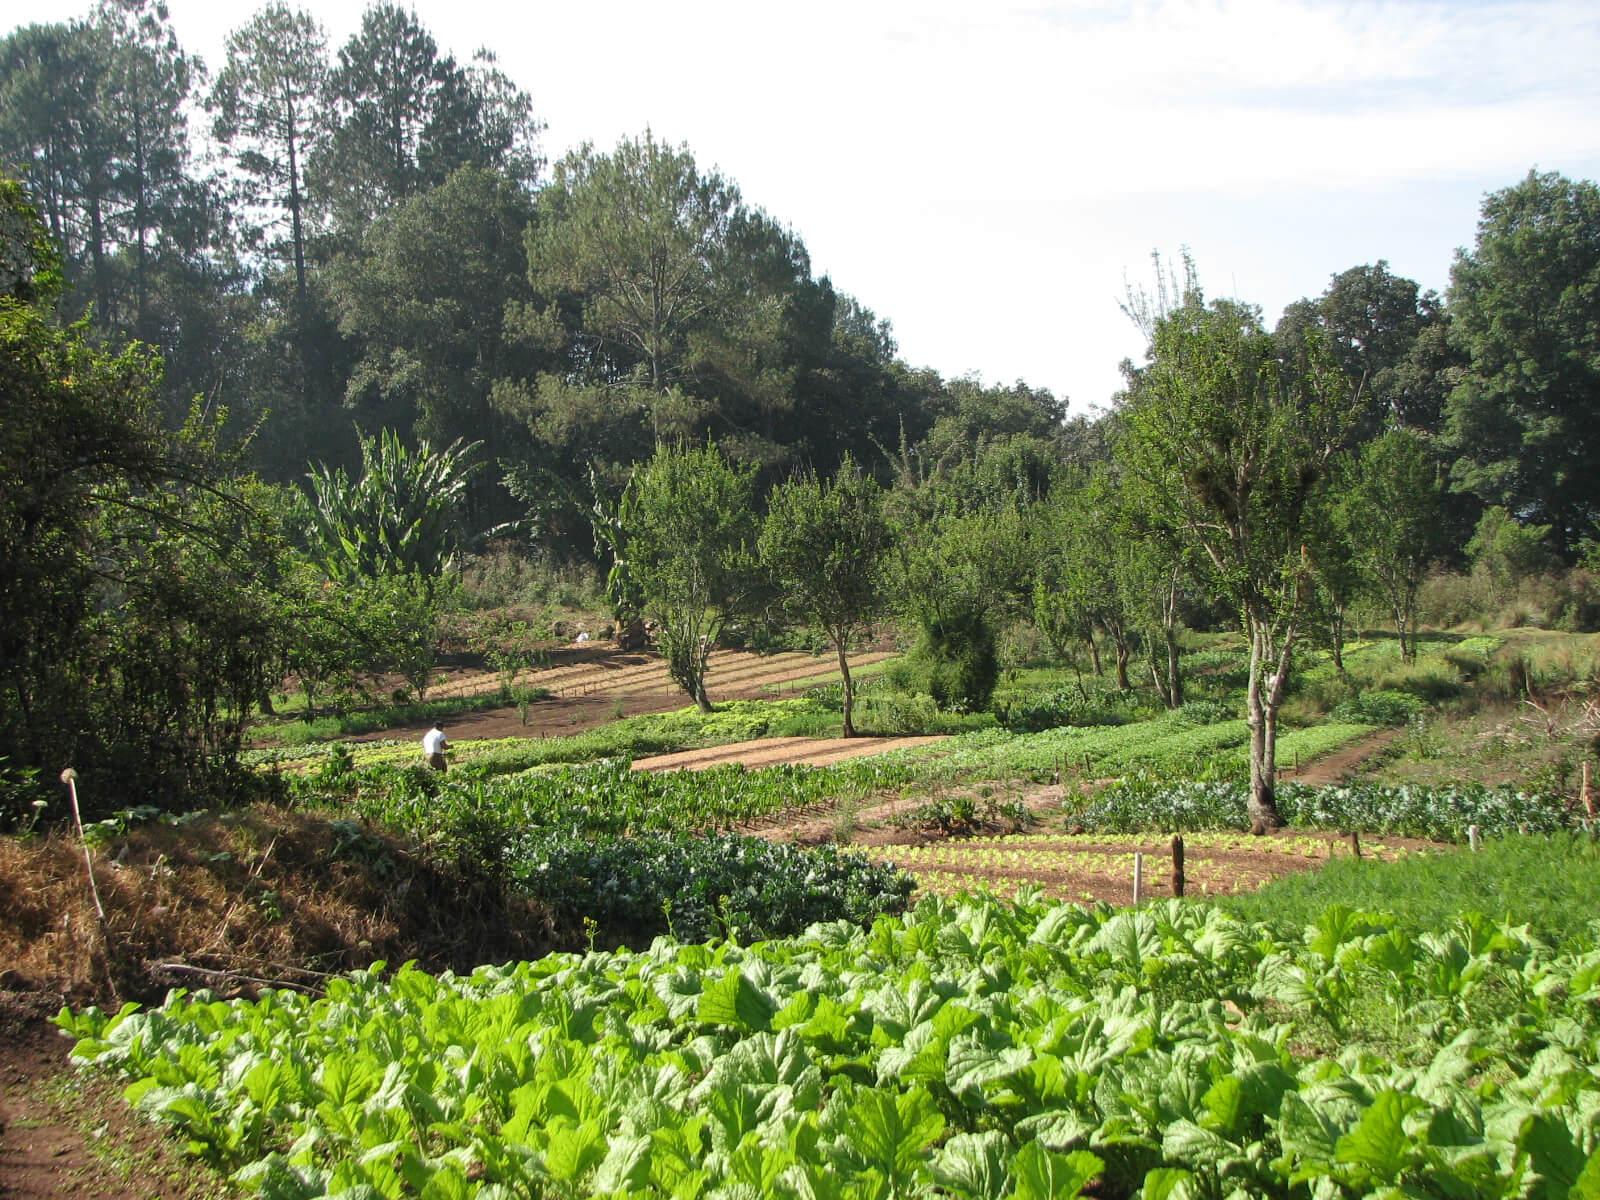 Diverse_organic_farm__near_San_Cristobal_de_las_Casas__2007.jpg